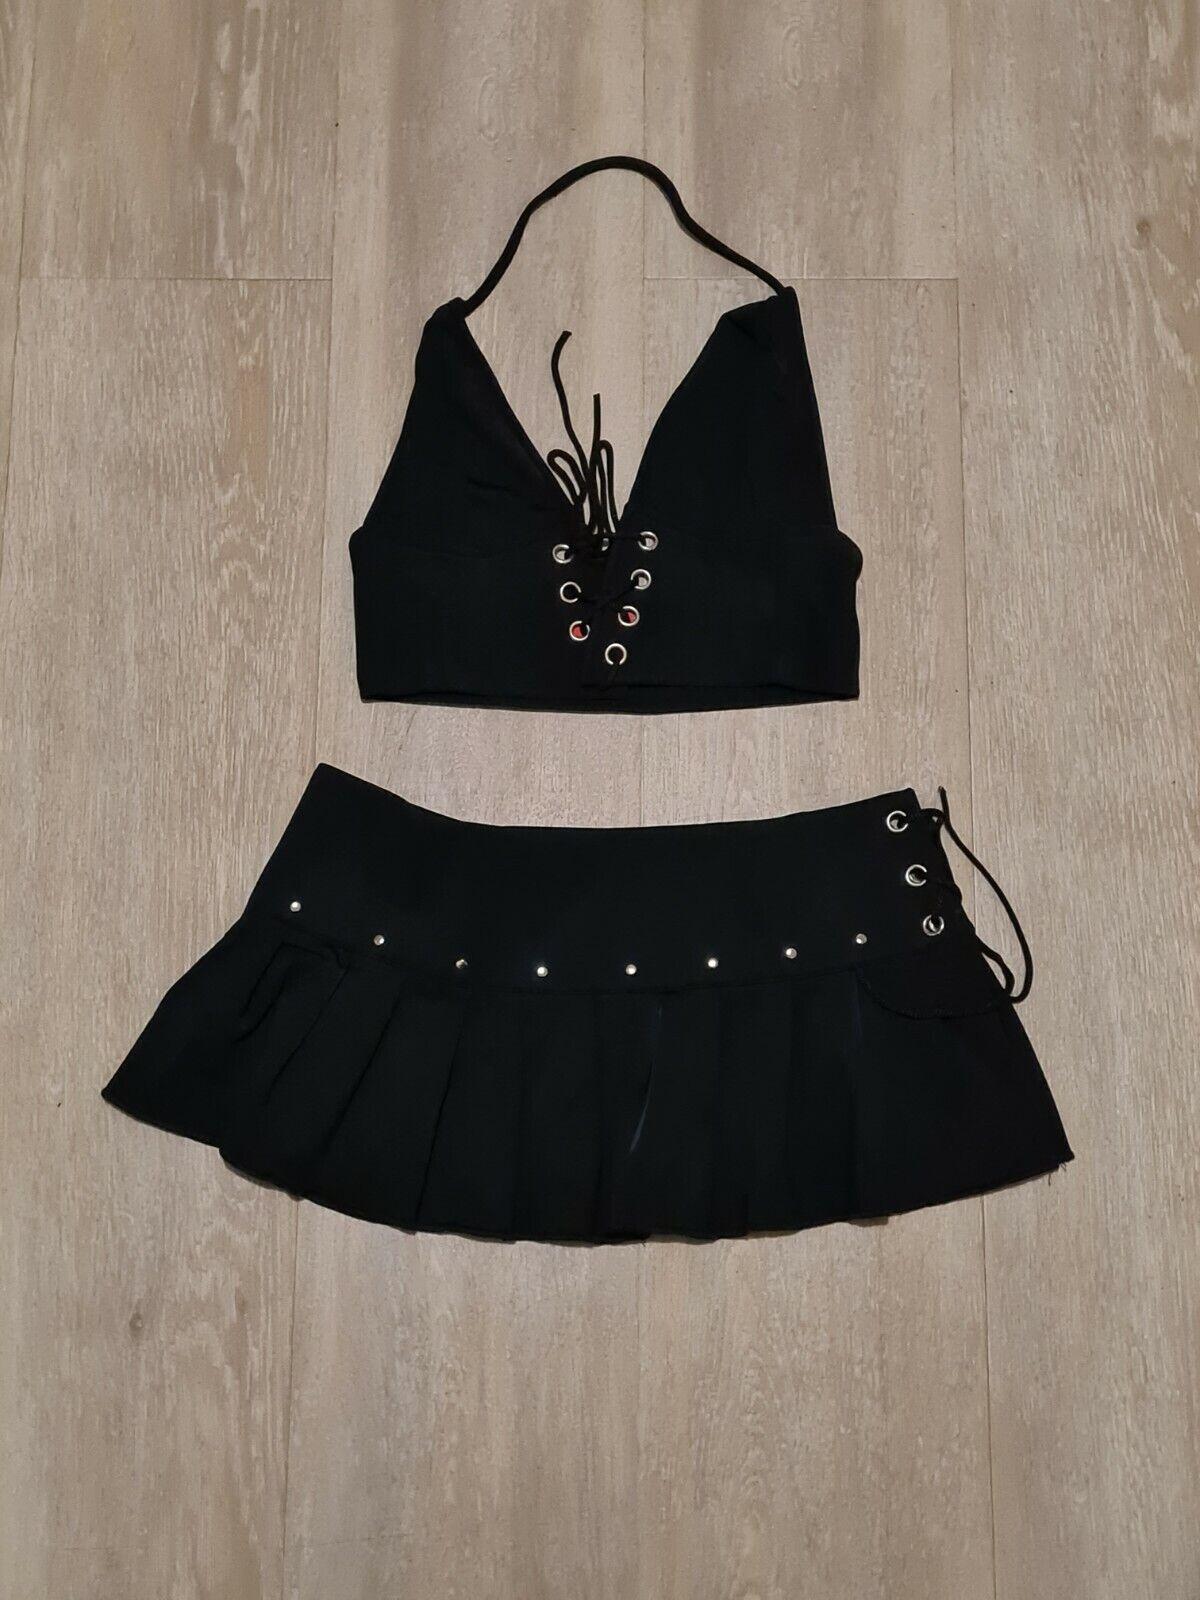 Gogo outfit Tanz Größe L Marke Fashion